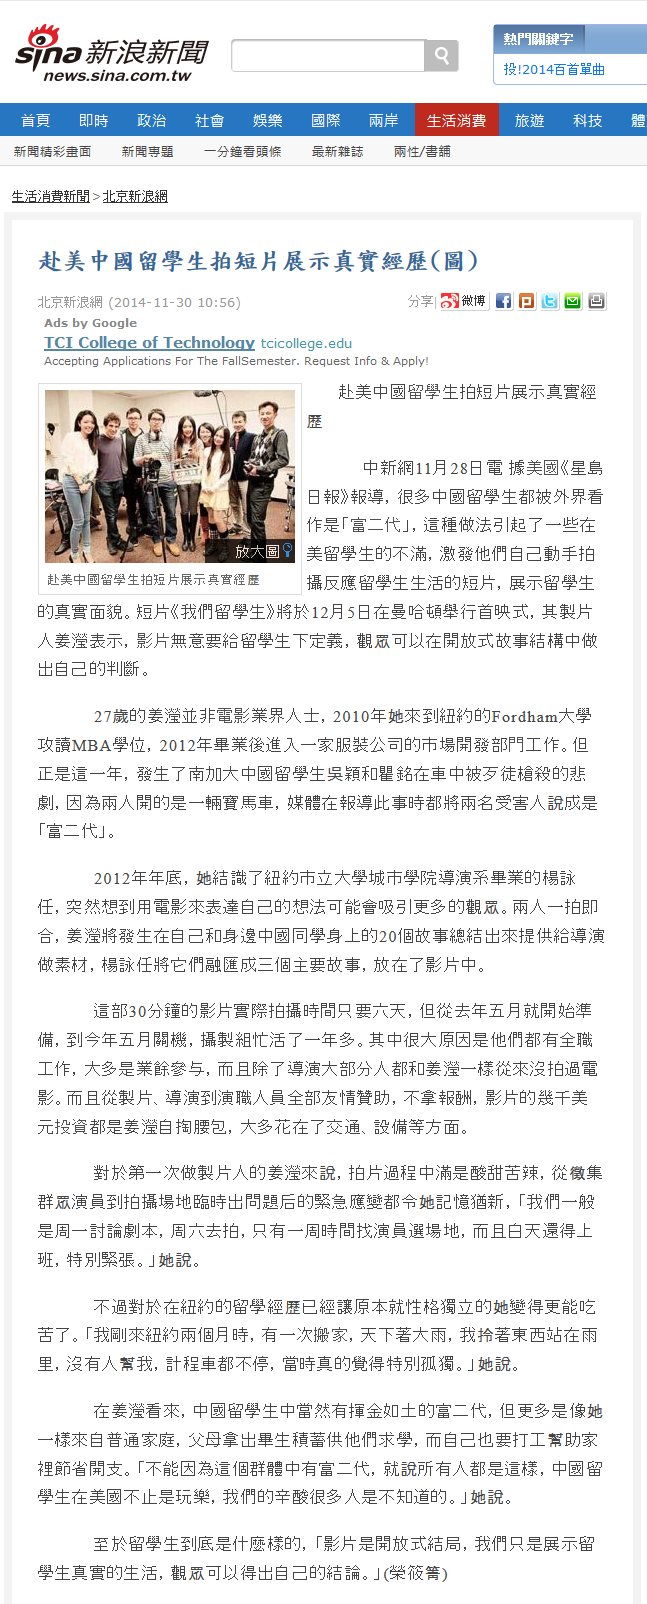 Sina News 11/30 report